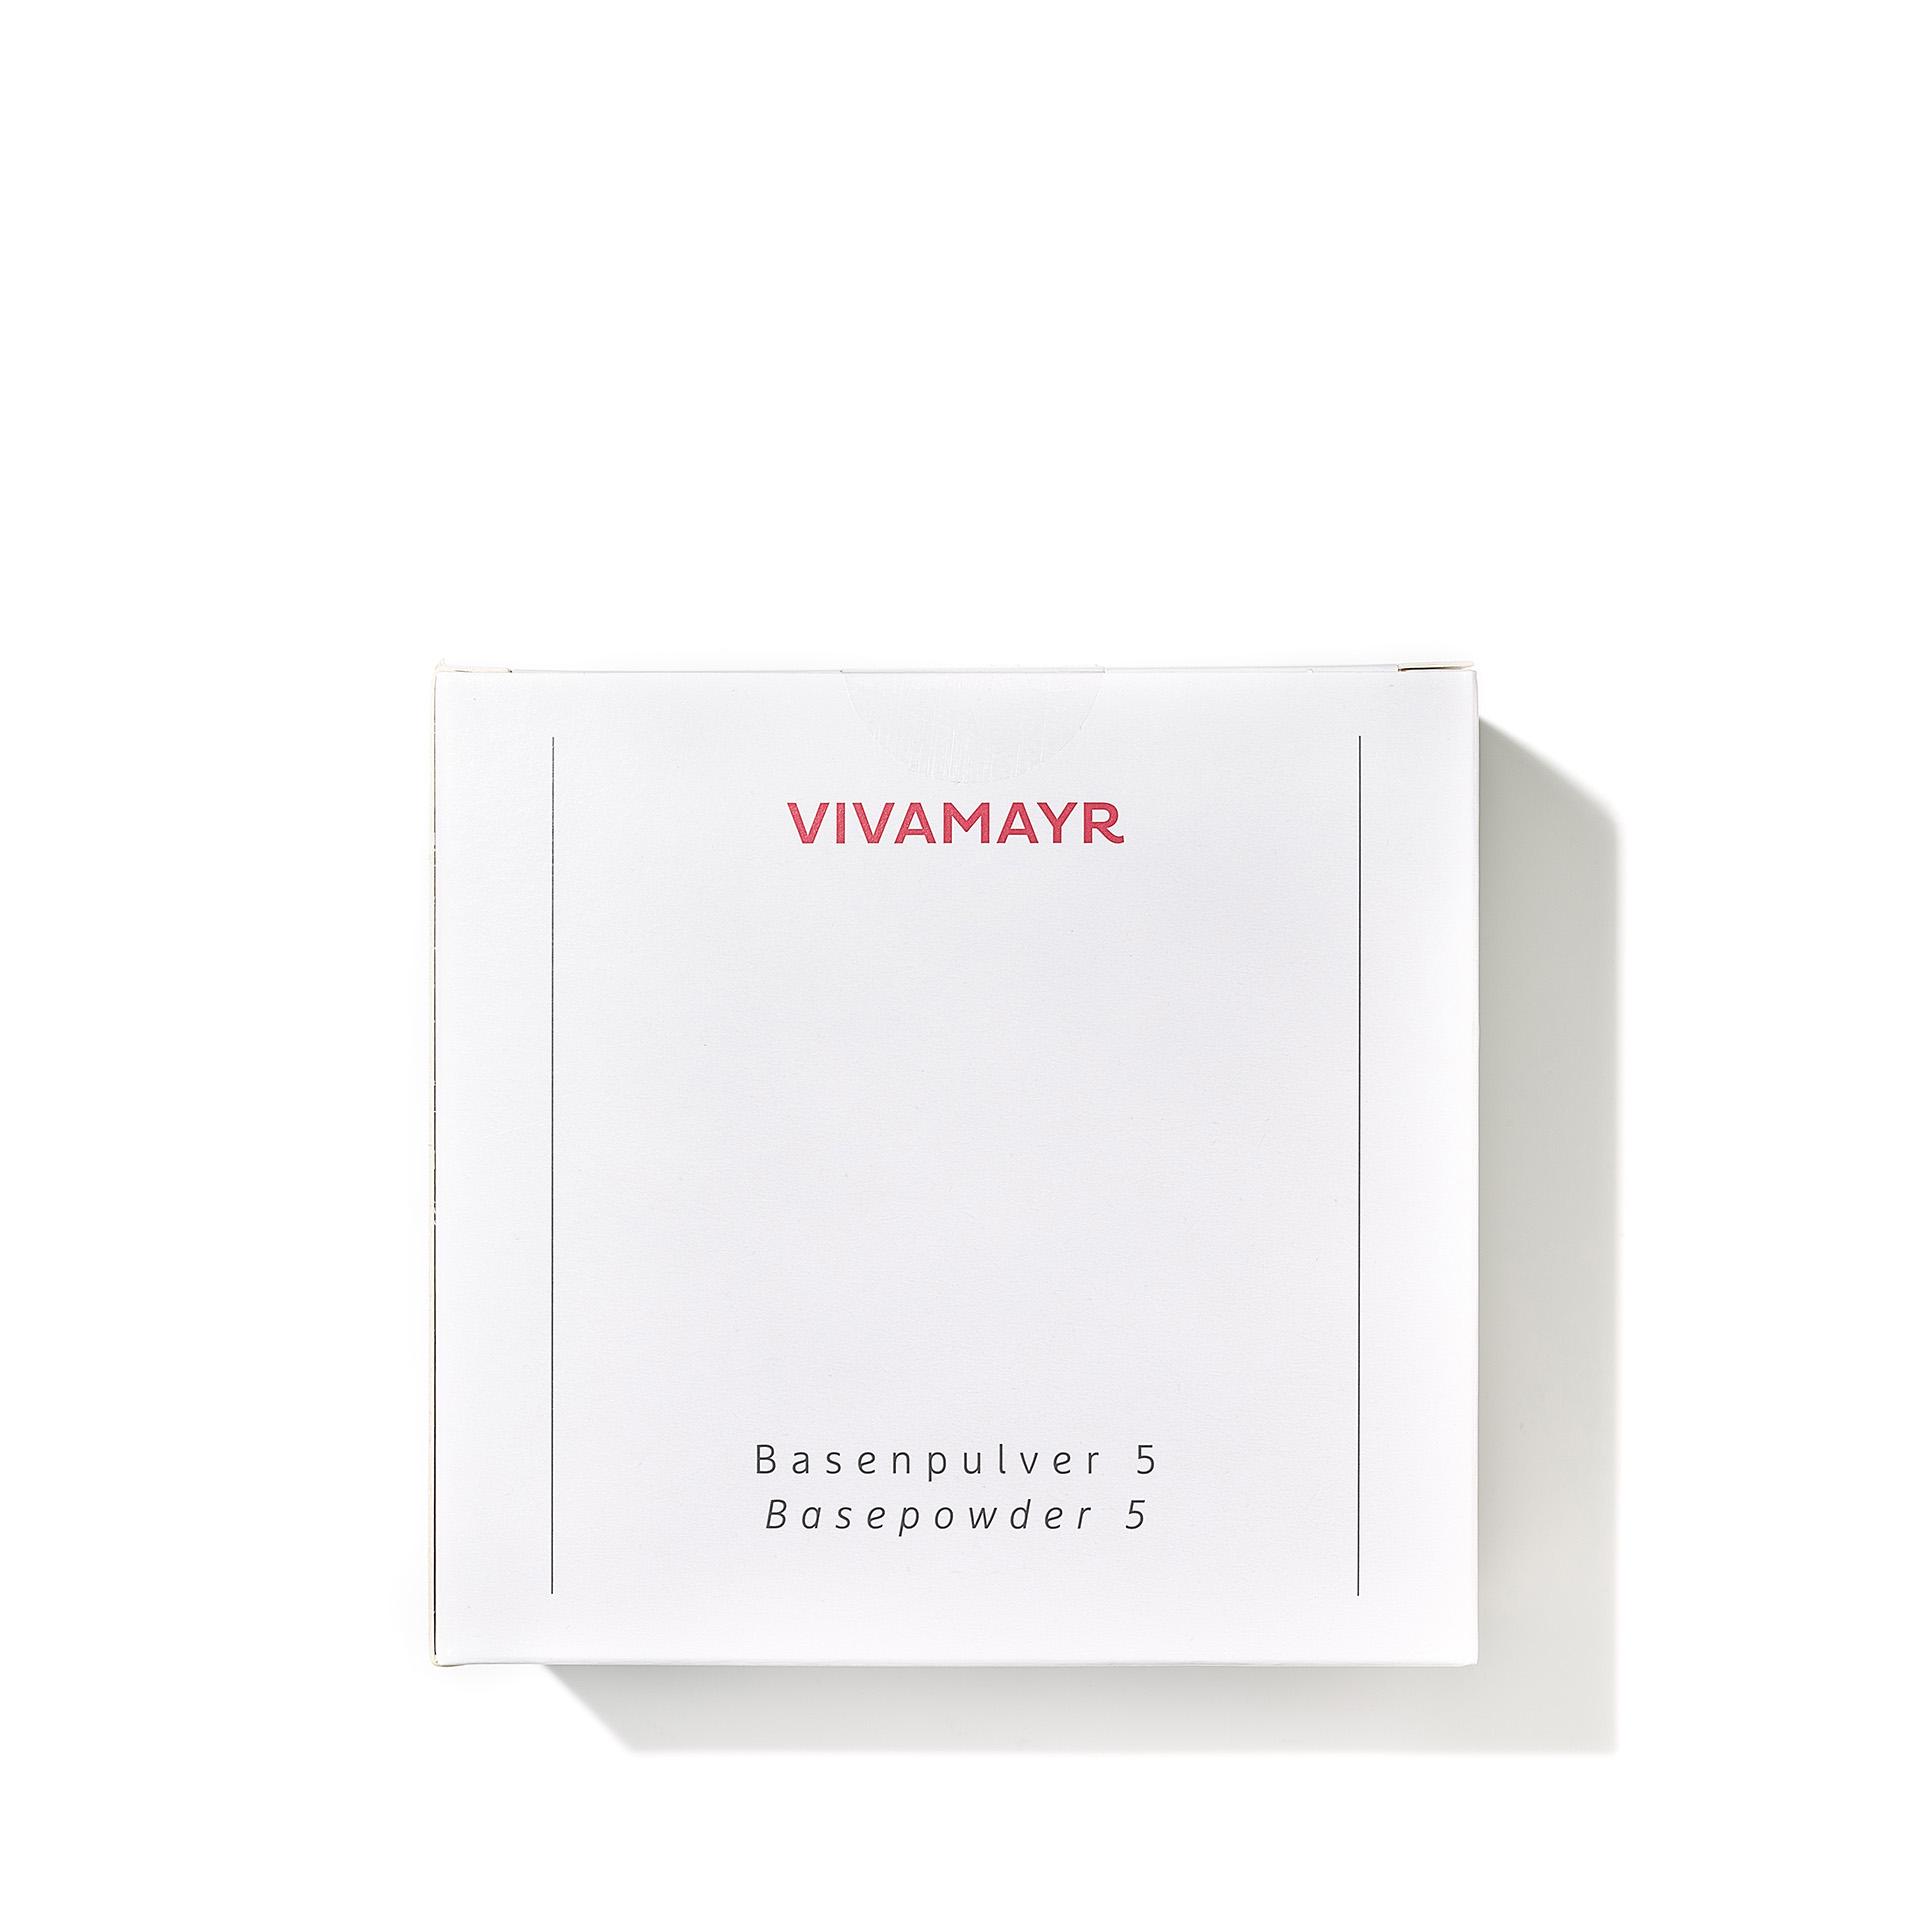 VIVAMAYR Basepowder 5 Sachets Package